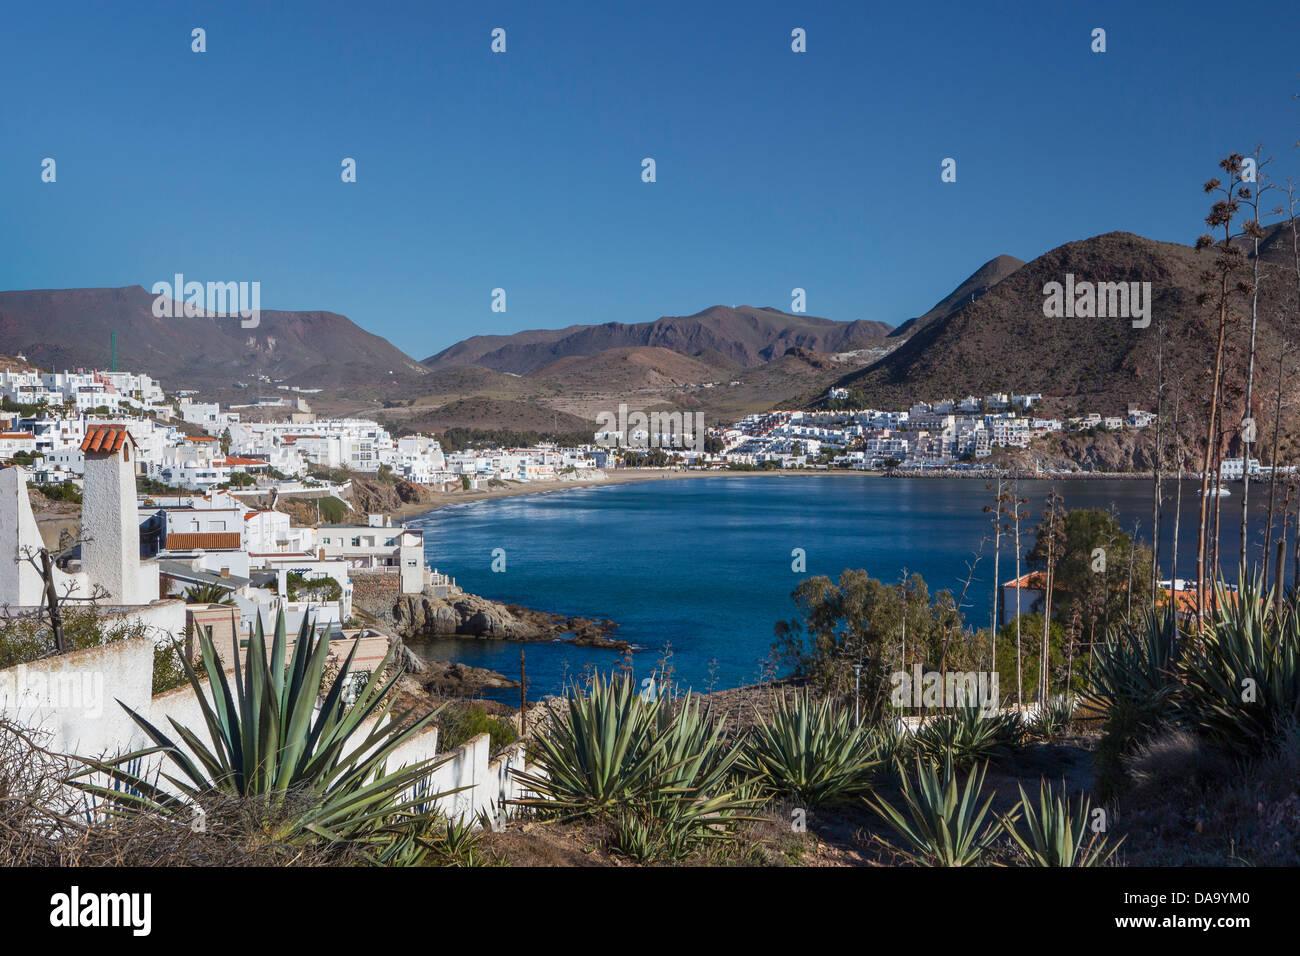 Almeria, Espagne, Europe, l'Andalousie, San Jose, plage, bleu, littoral, paysage, Méditerranée, pueblo, Photo Stock